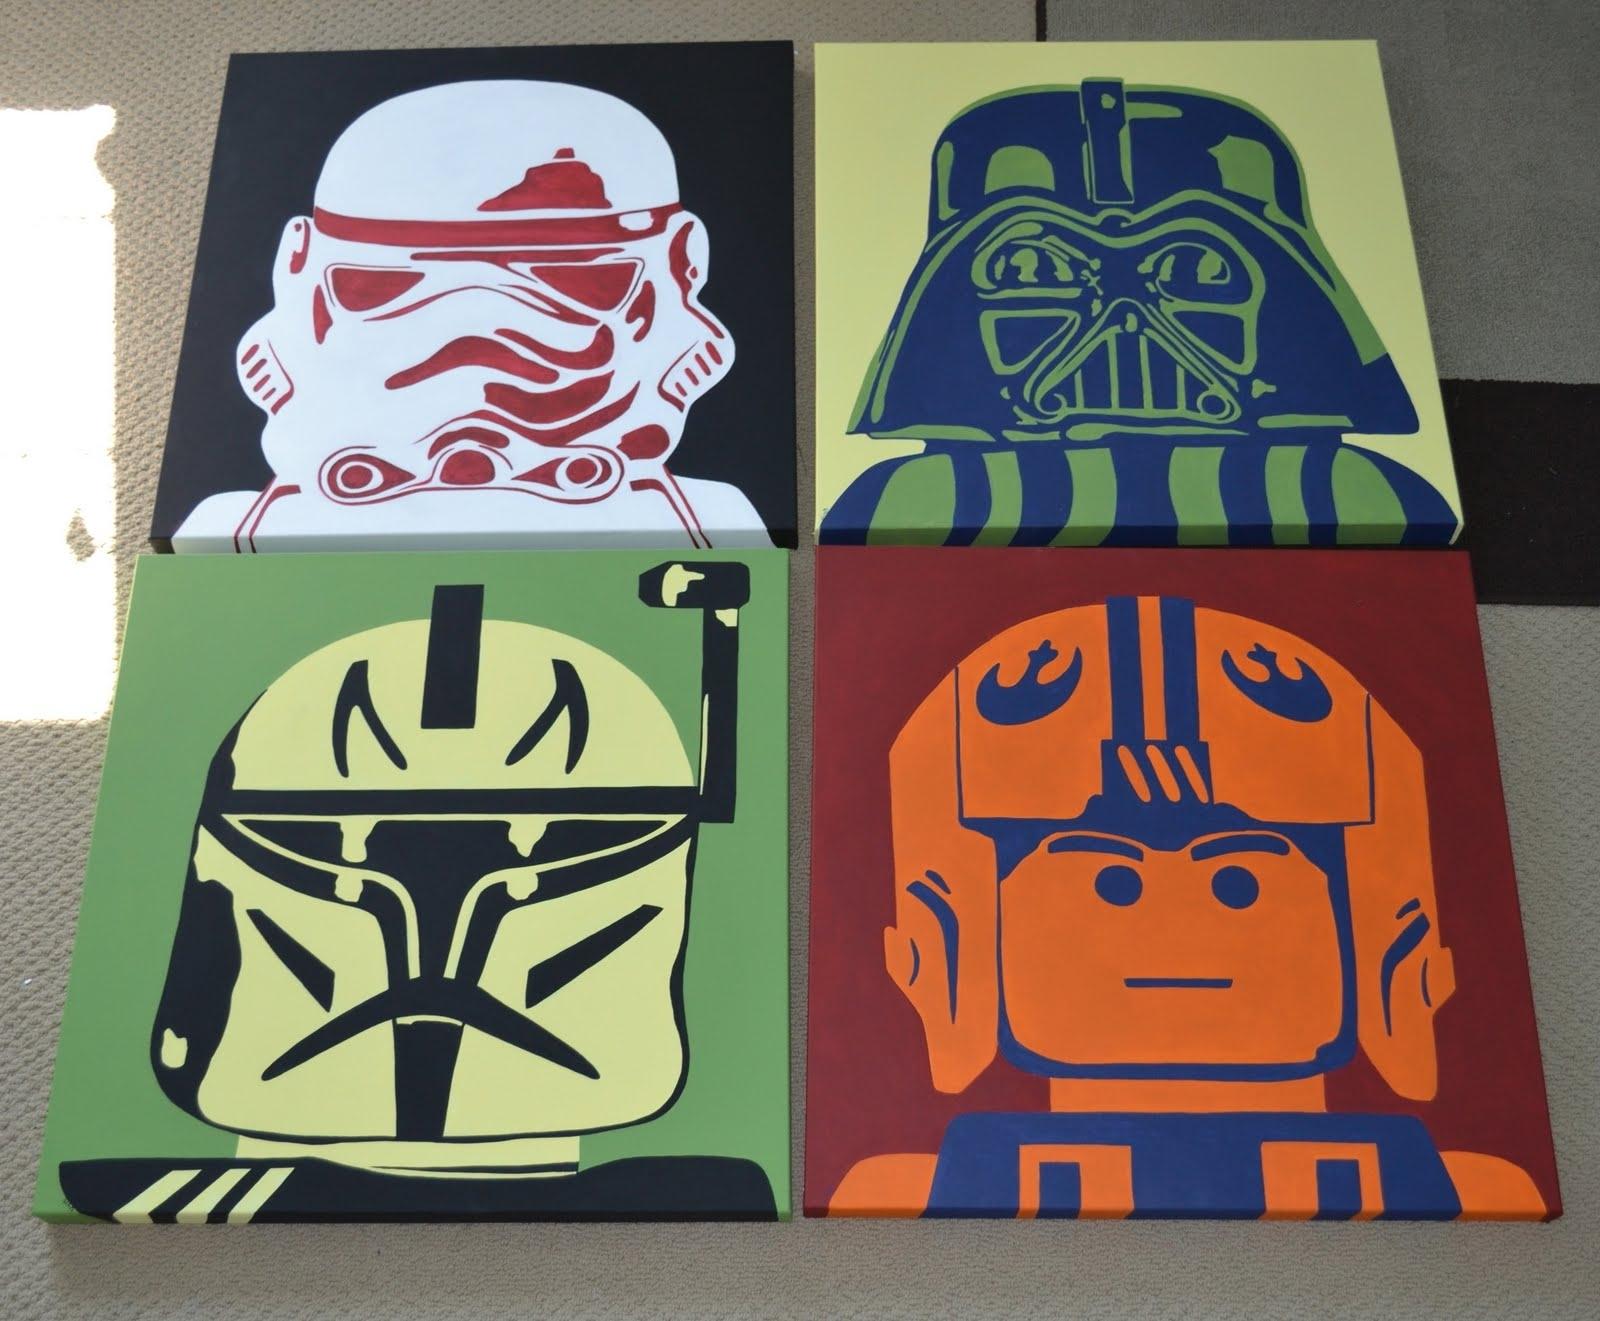 You're Artcorie Kline: Star Wars Legos Pop Art Intended For Preferred Lego Star Wars Wall Art (View 2 of 15)